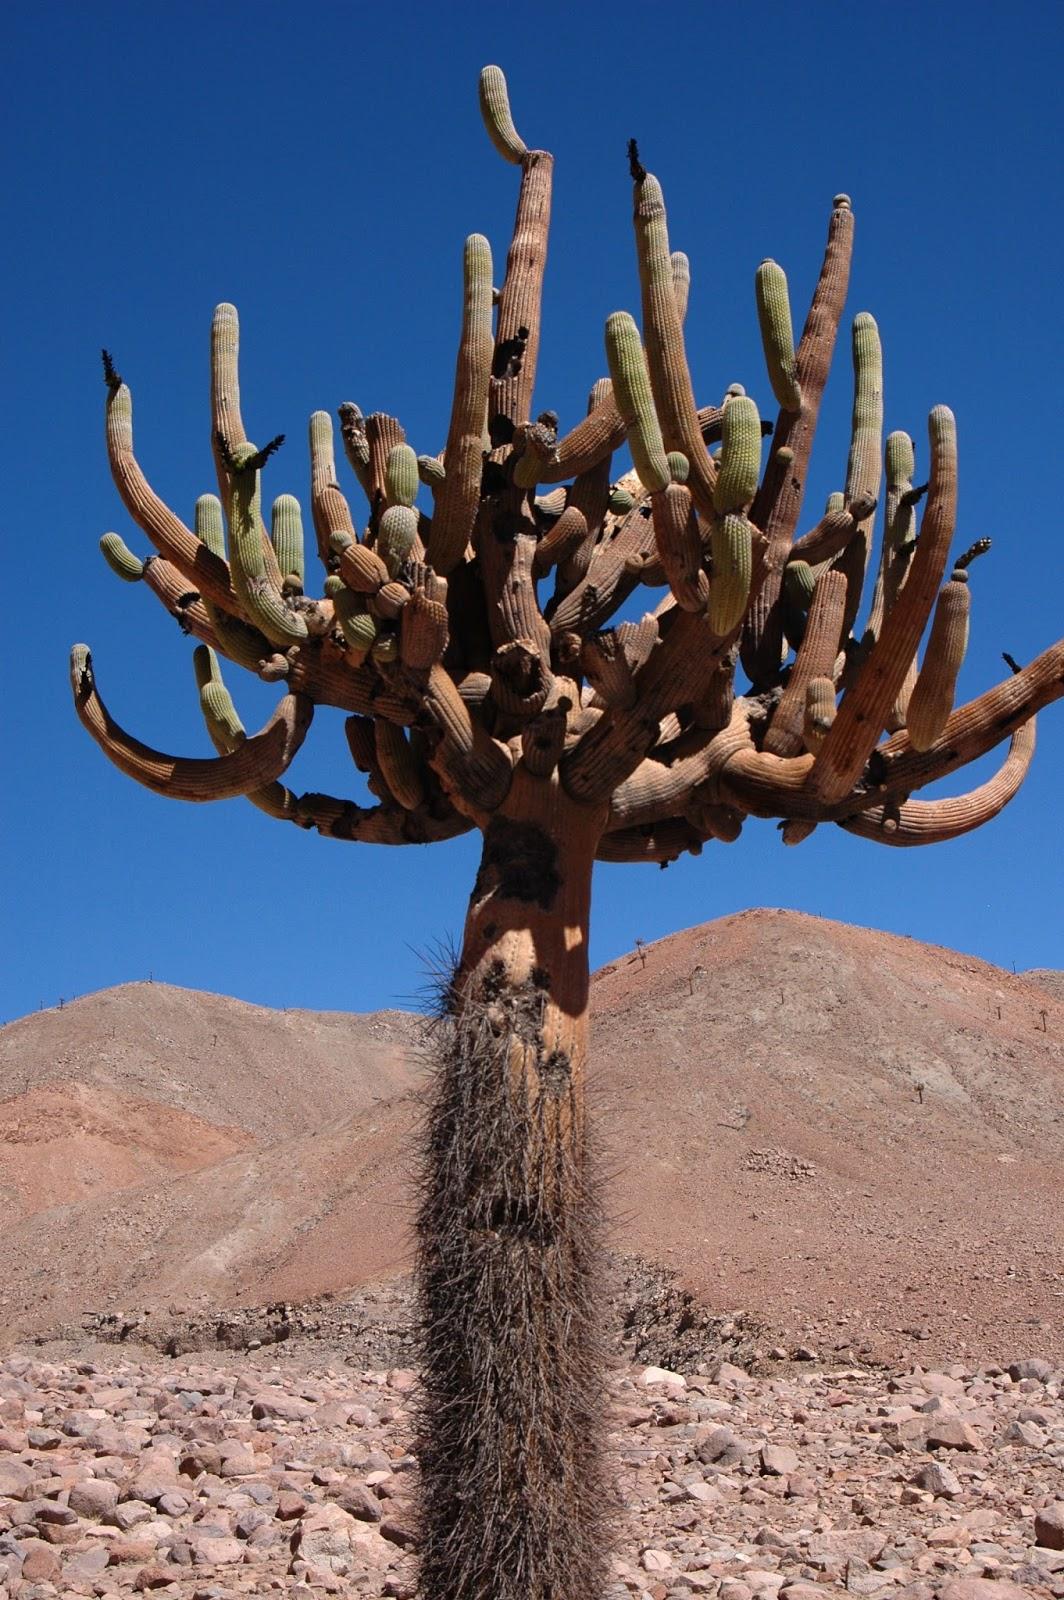 Turismo iv regi n la riqueza de chile flora y fauna for Cactaceas de chile